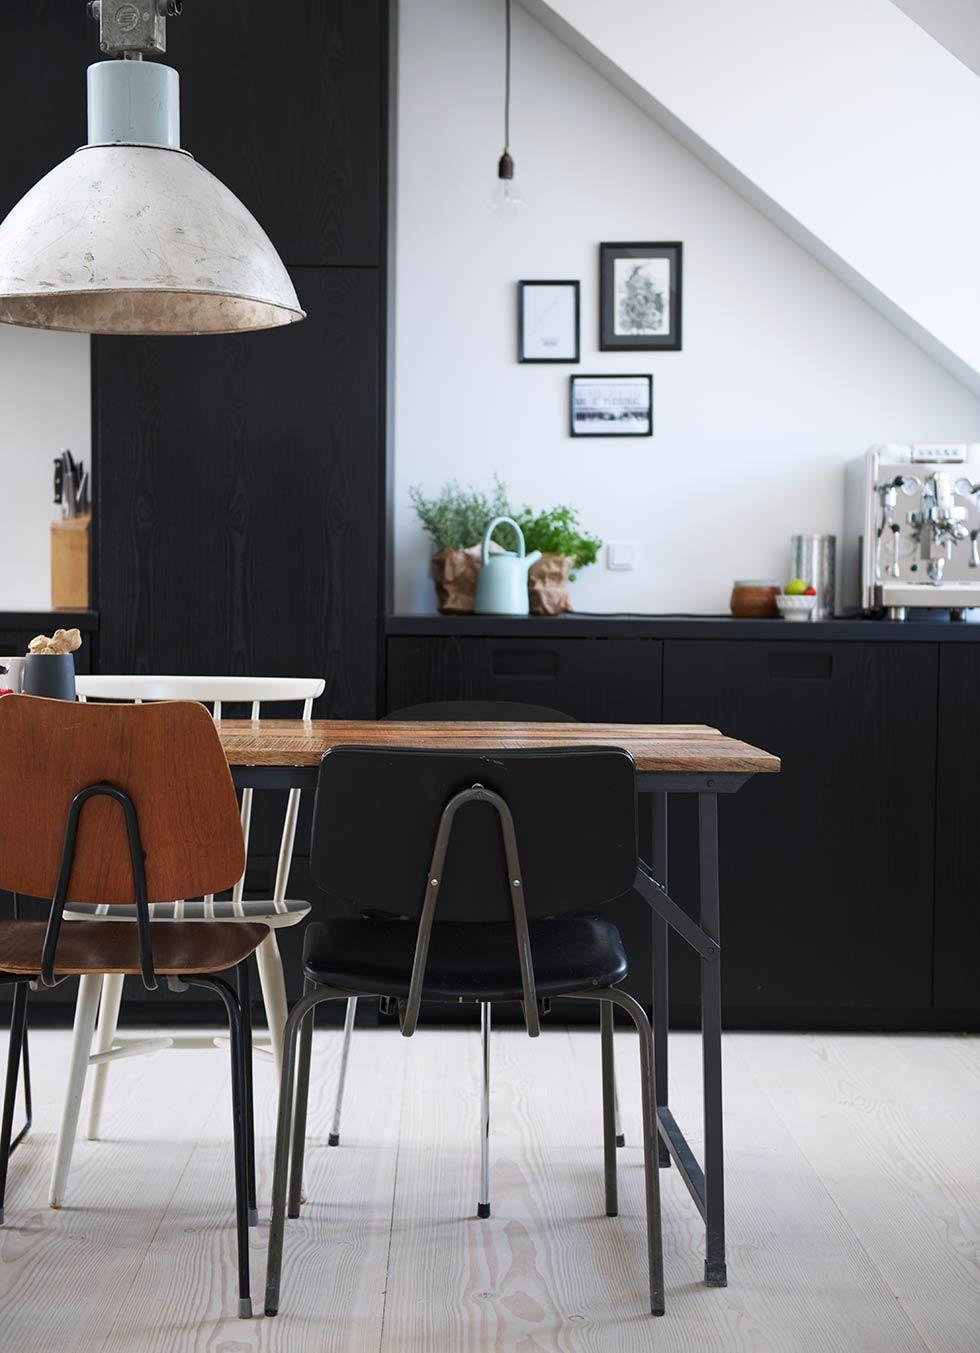 Zwarte keuken van Deense juwelier Annette